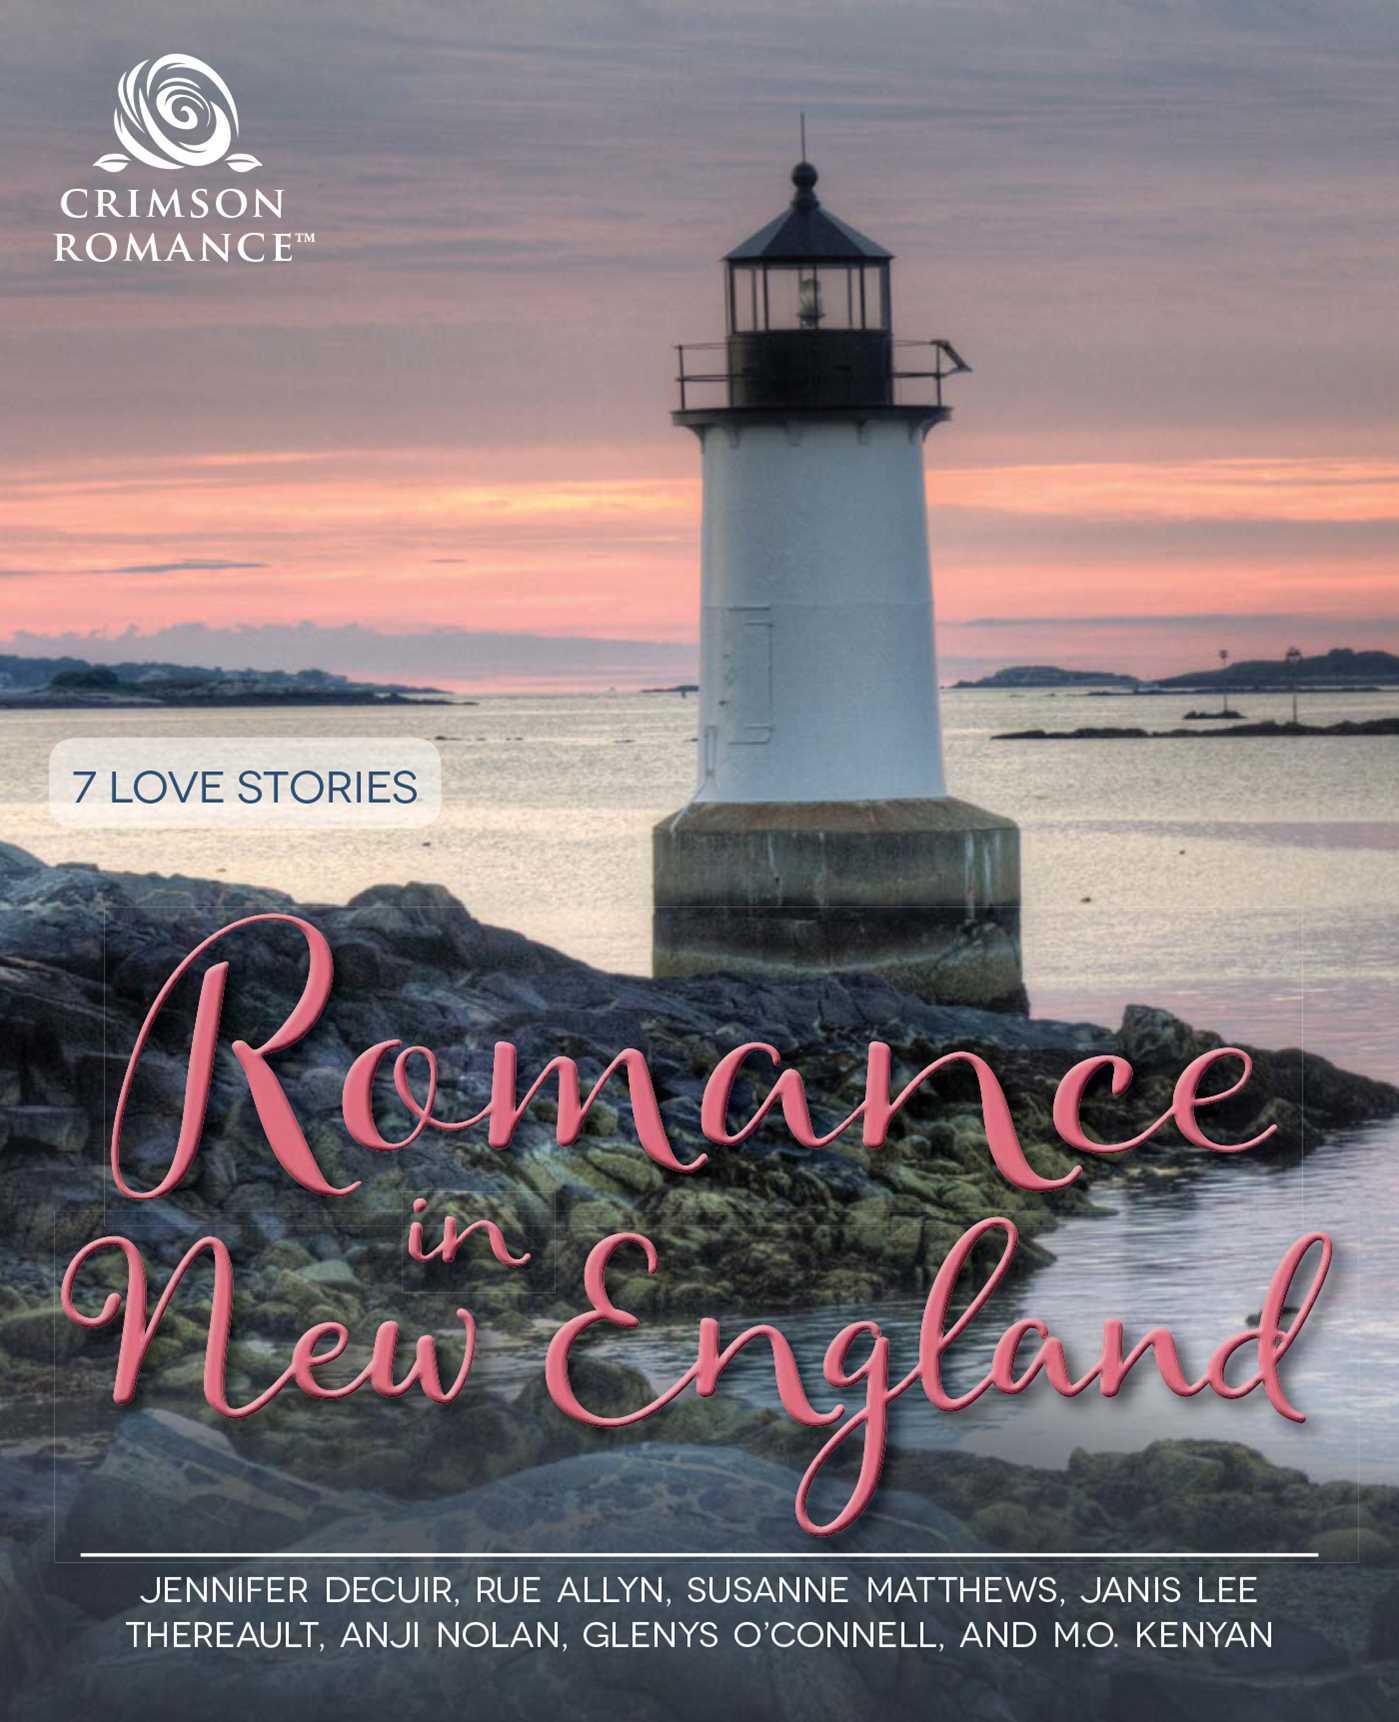 Romance in new england 9781507203514 hr